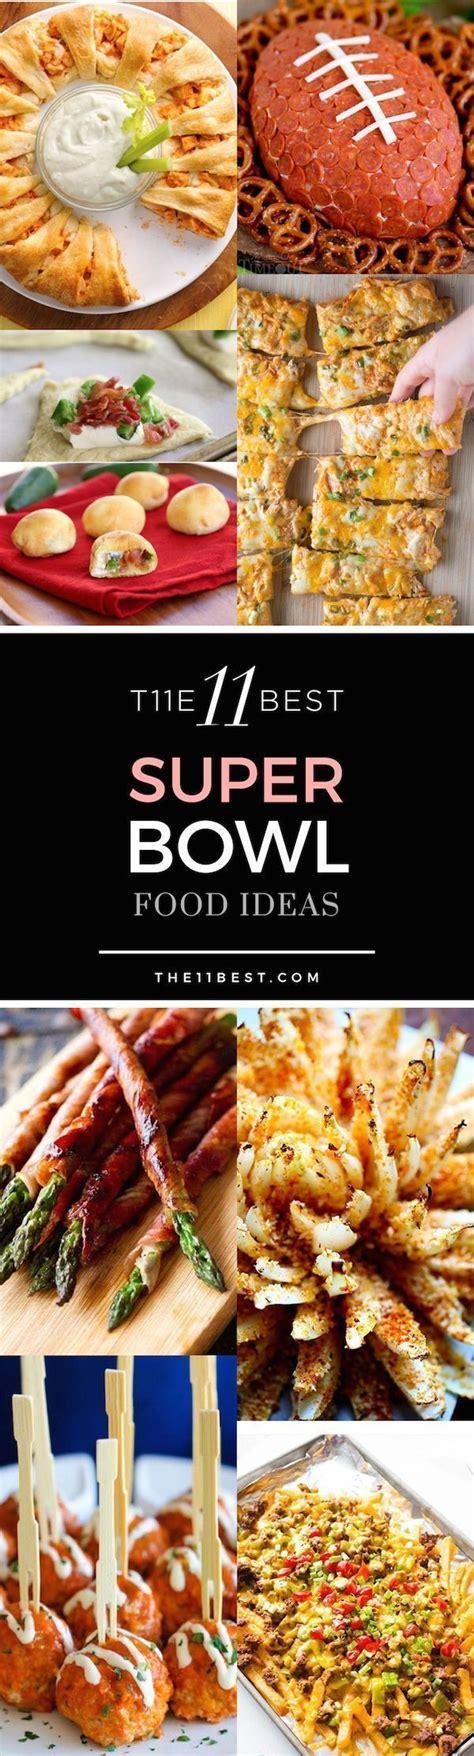 the ultimate super bowl food ideas list 165 recipes the 25 best super bowl ideas on pinterest super bowl